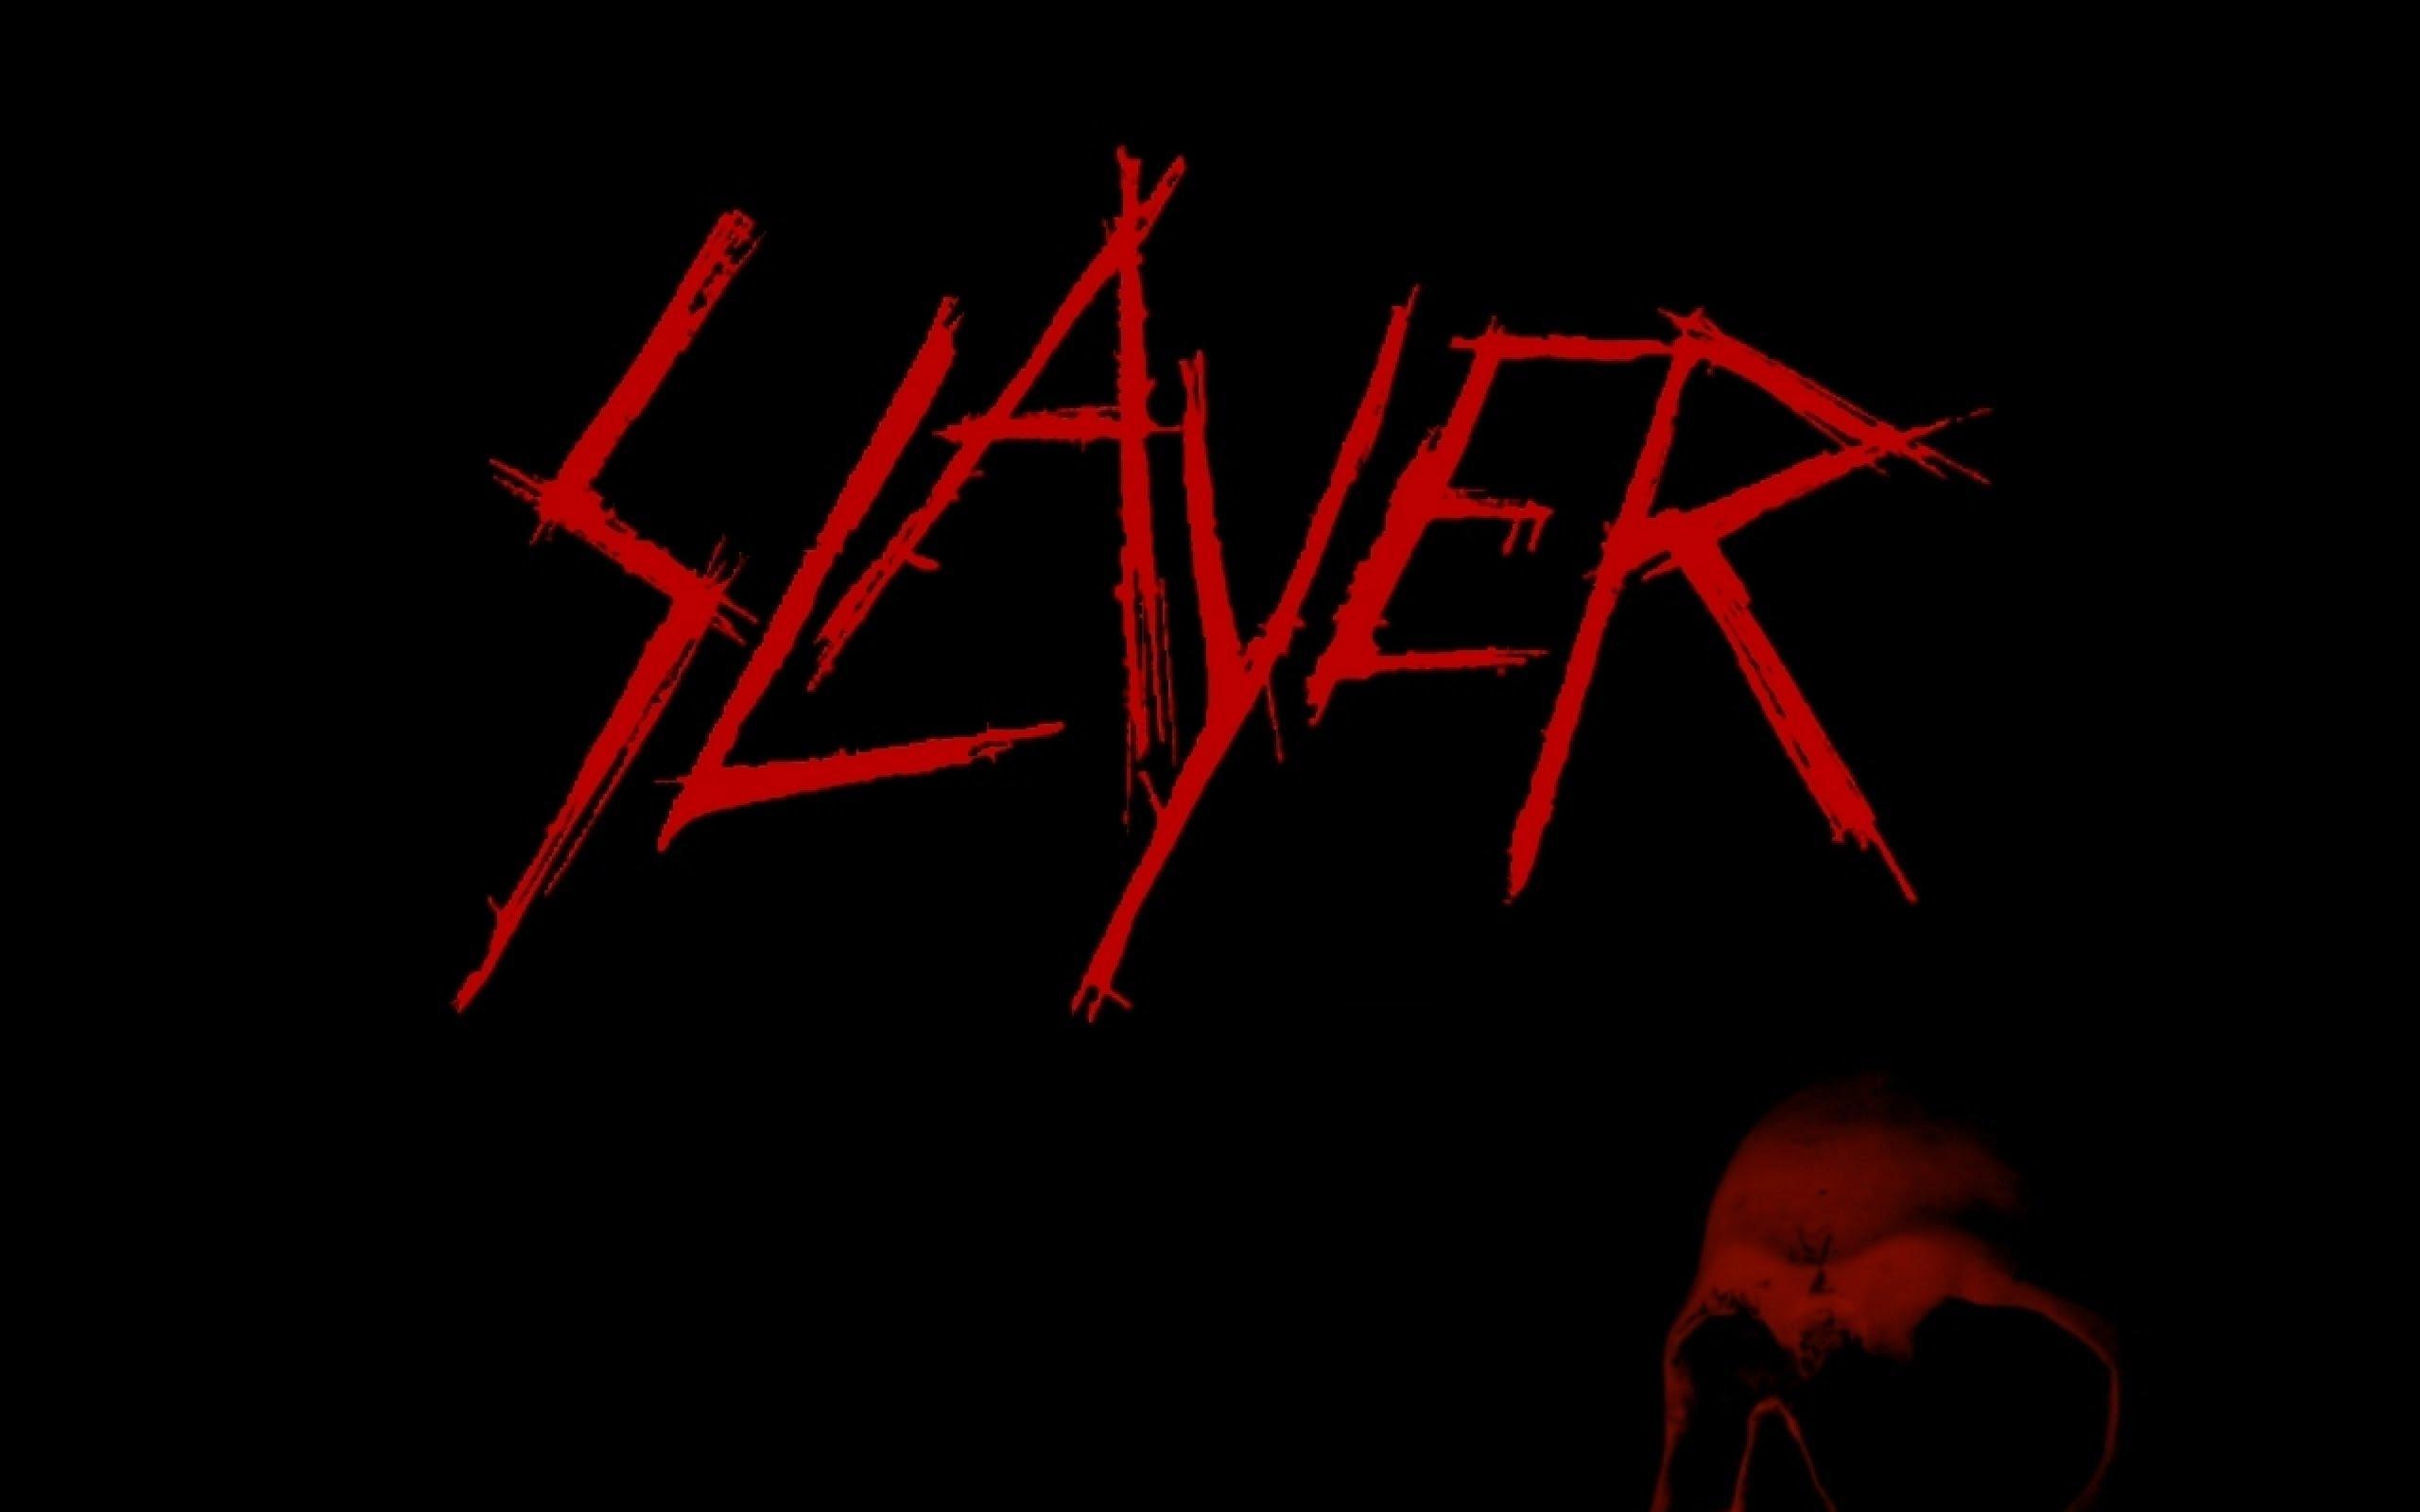 High Resolution Wallpaper | Slayer 2560x1600 px